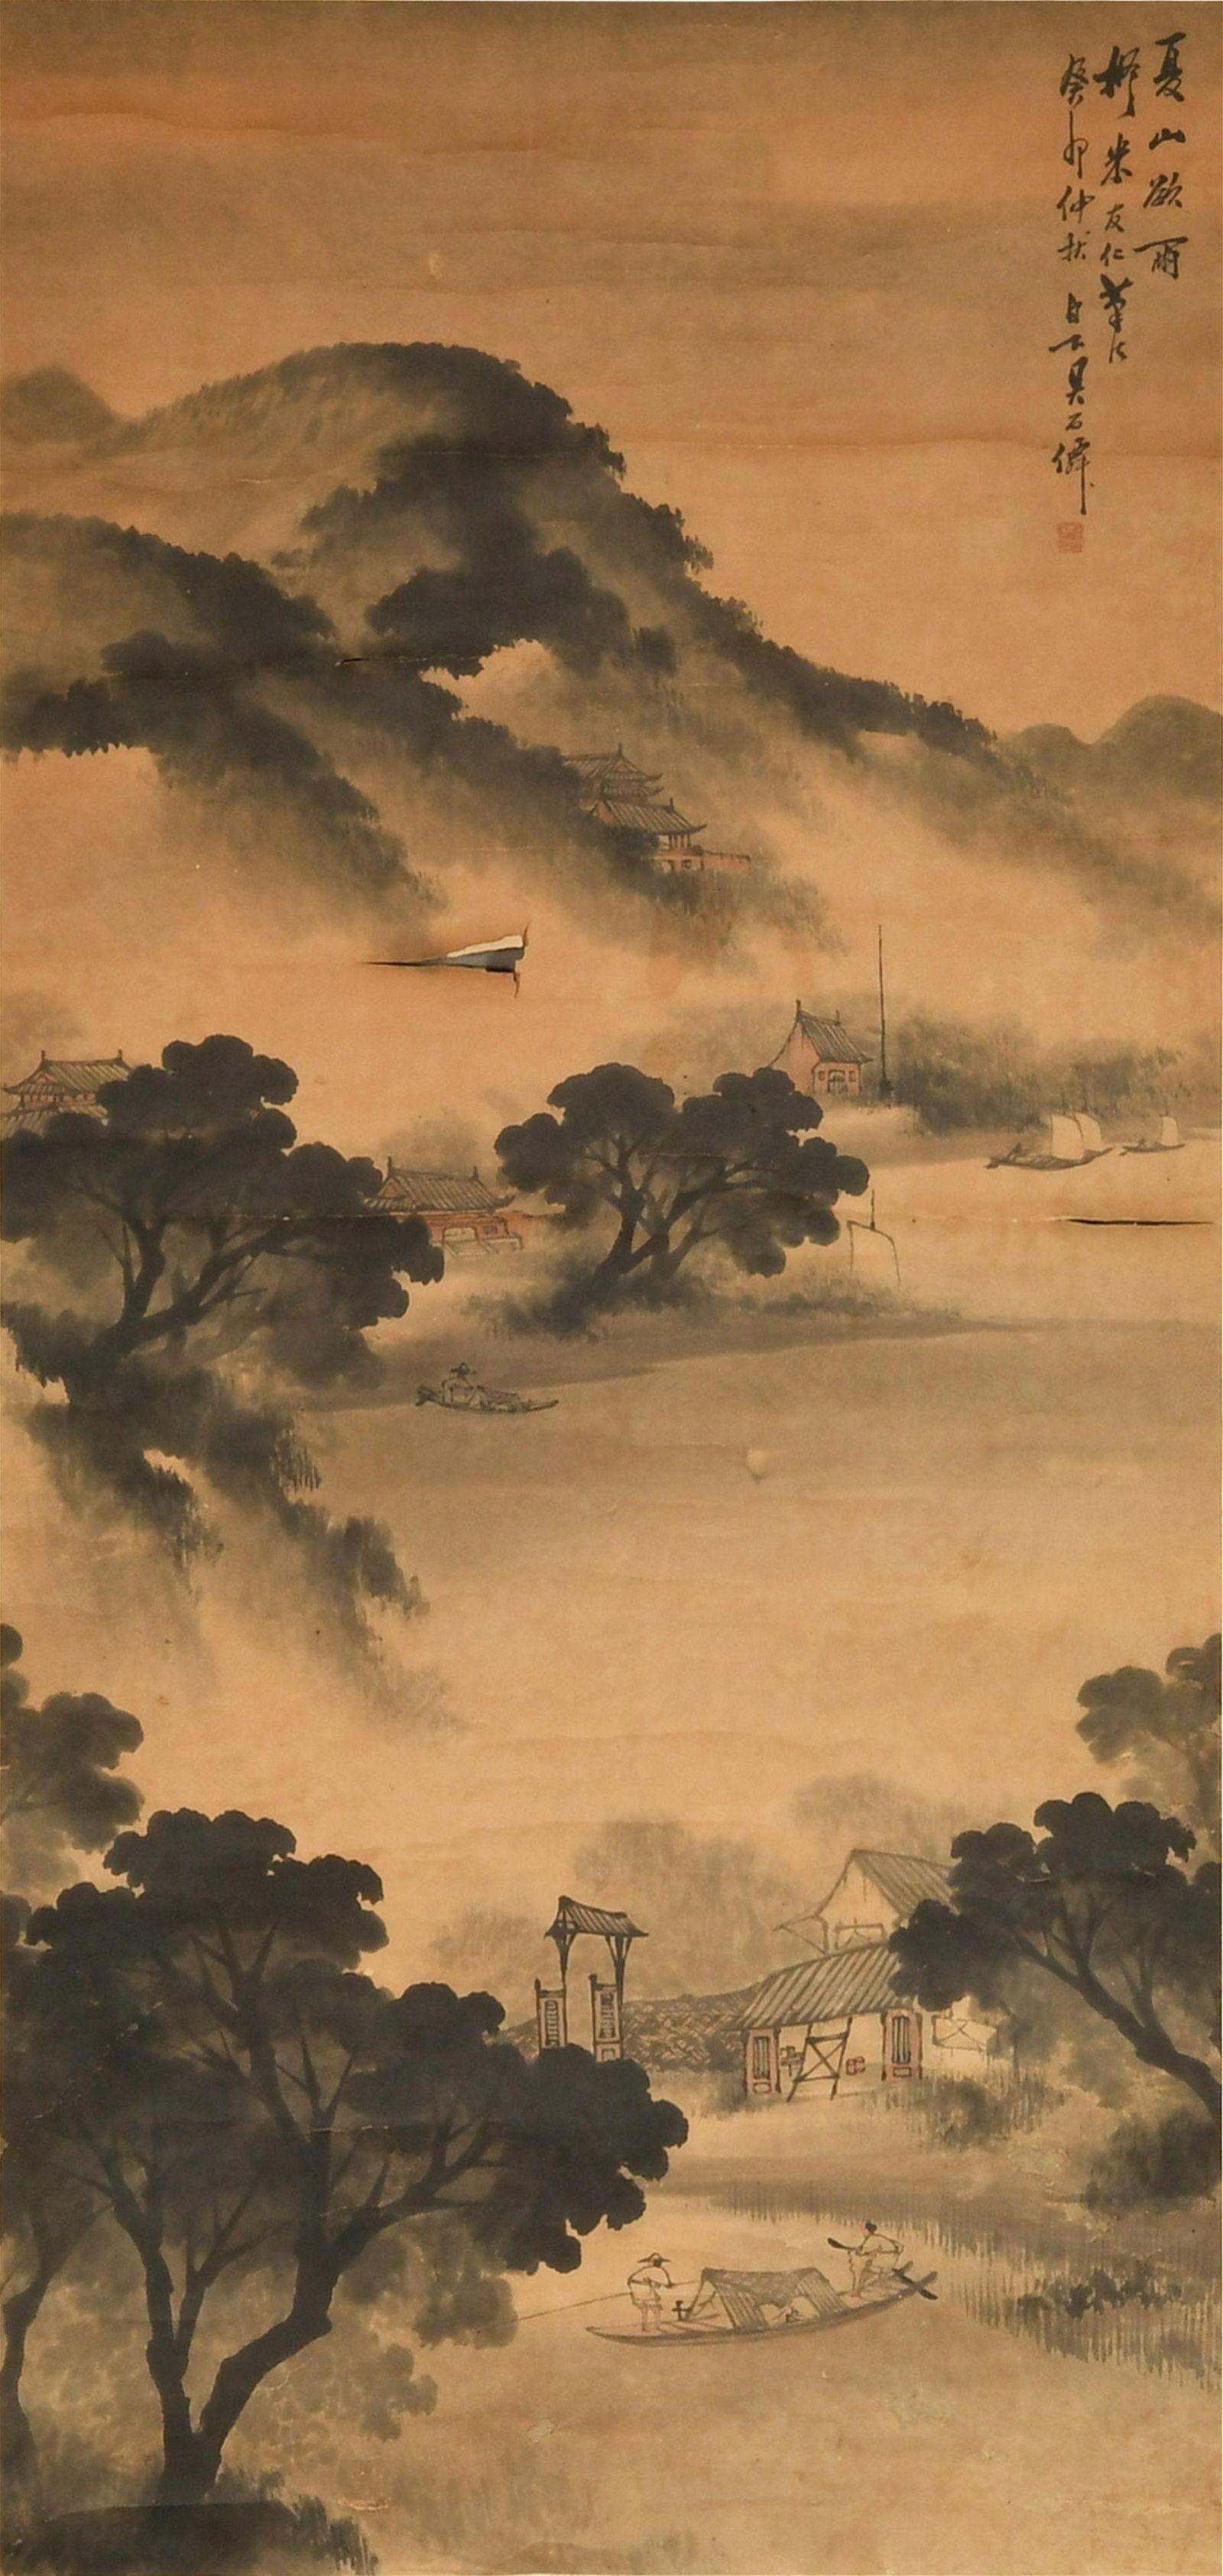 Chinese Landscape Painting by Wu Shixian